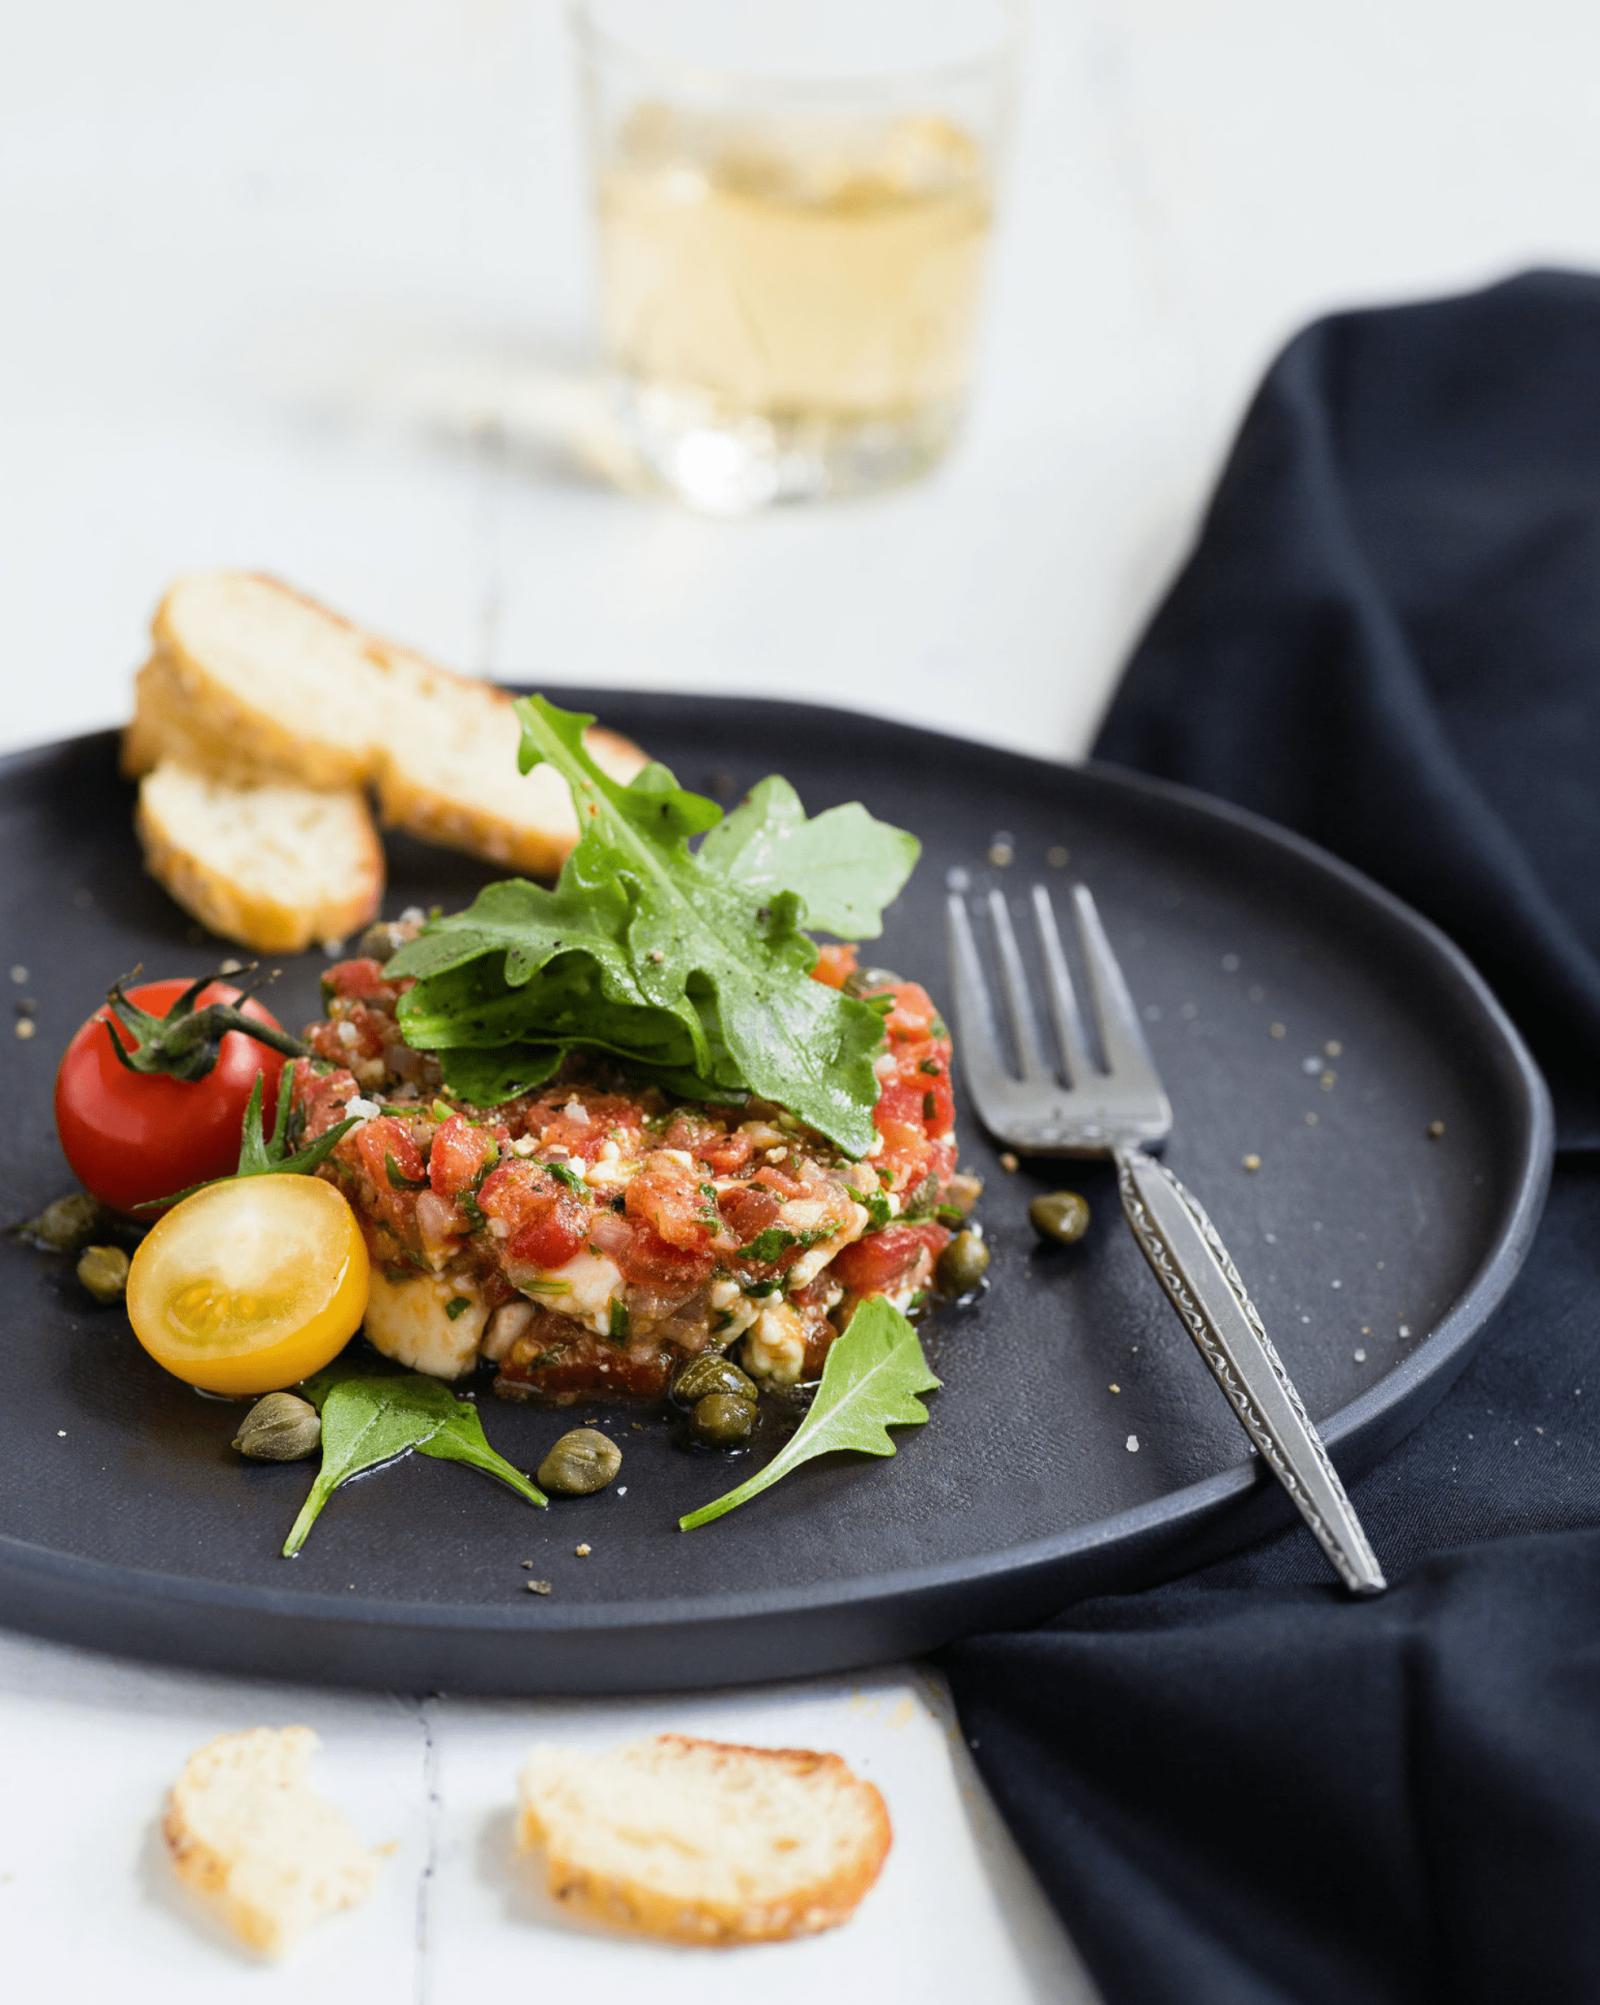 Quasi-classic Feta and Arugula Tomato Tartare